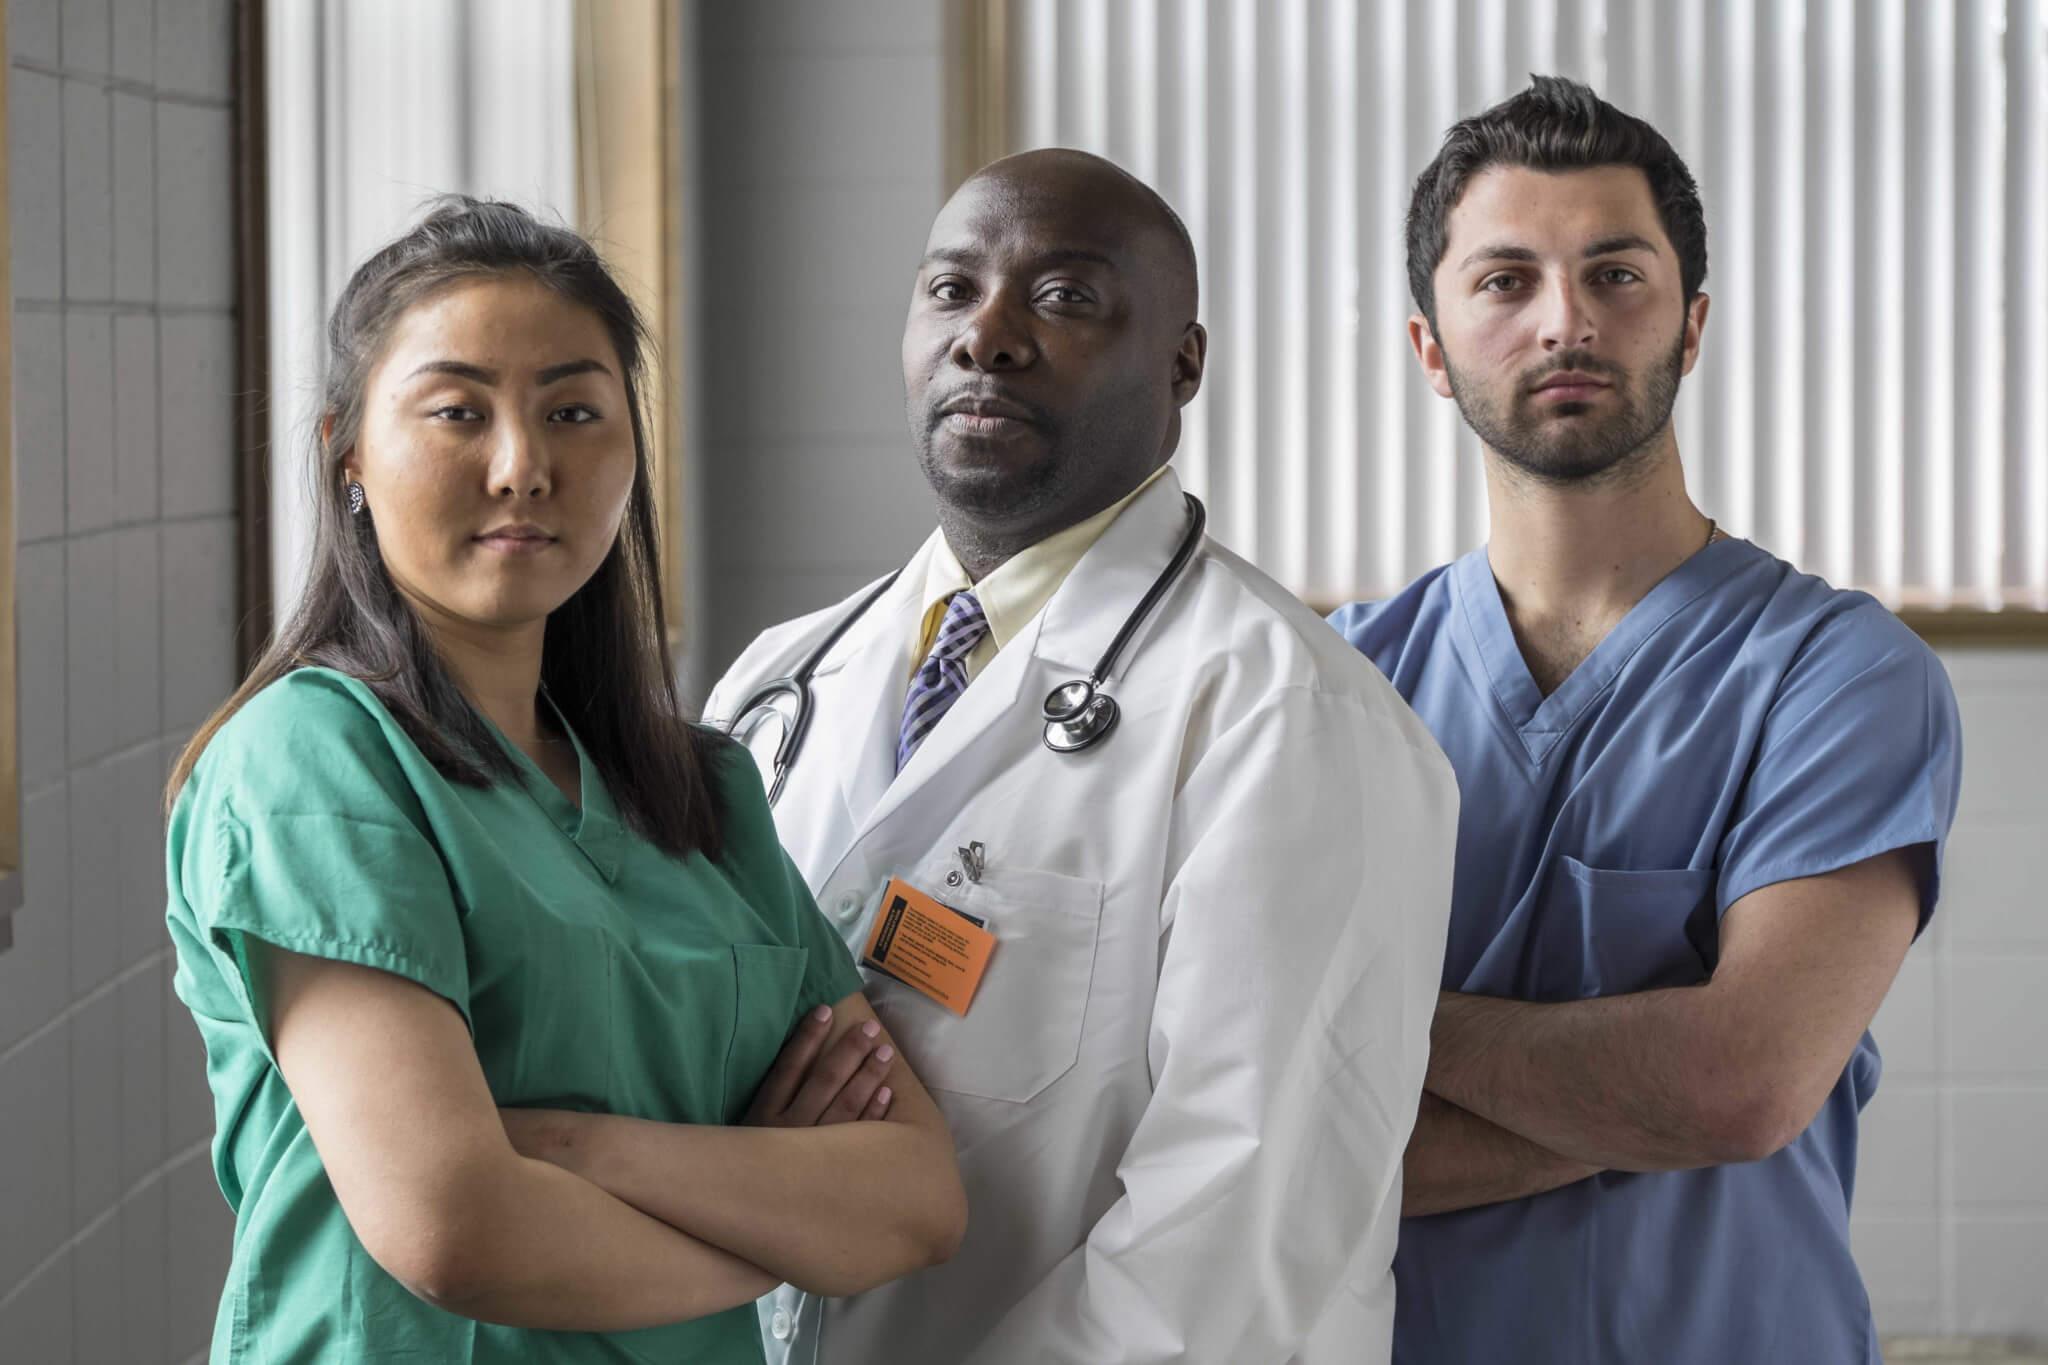 Doctors dealing with patient bias and prejudice